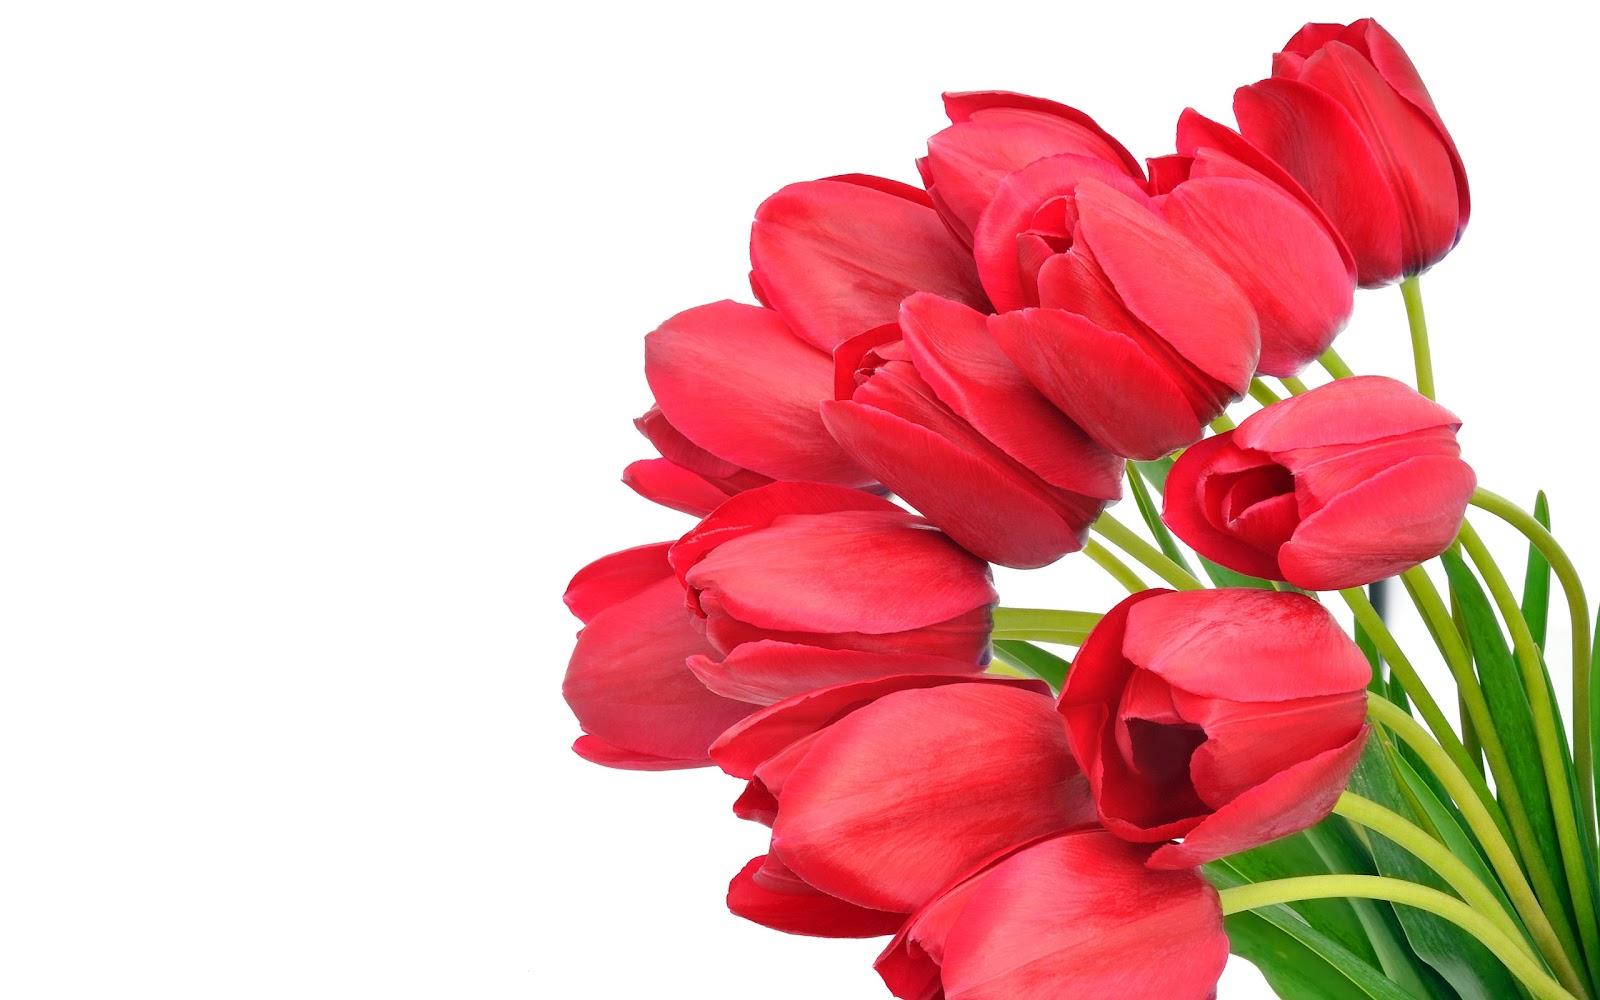 Beautiful flowers wallpapers latest news beautiful flowers wallpapers posted by waqas97 0402 1 wallpapers izmirmasajfo